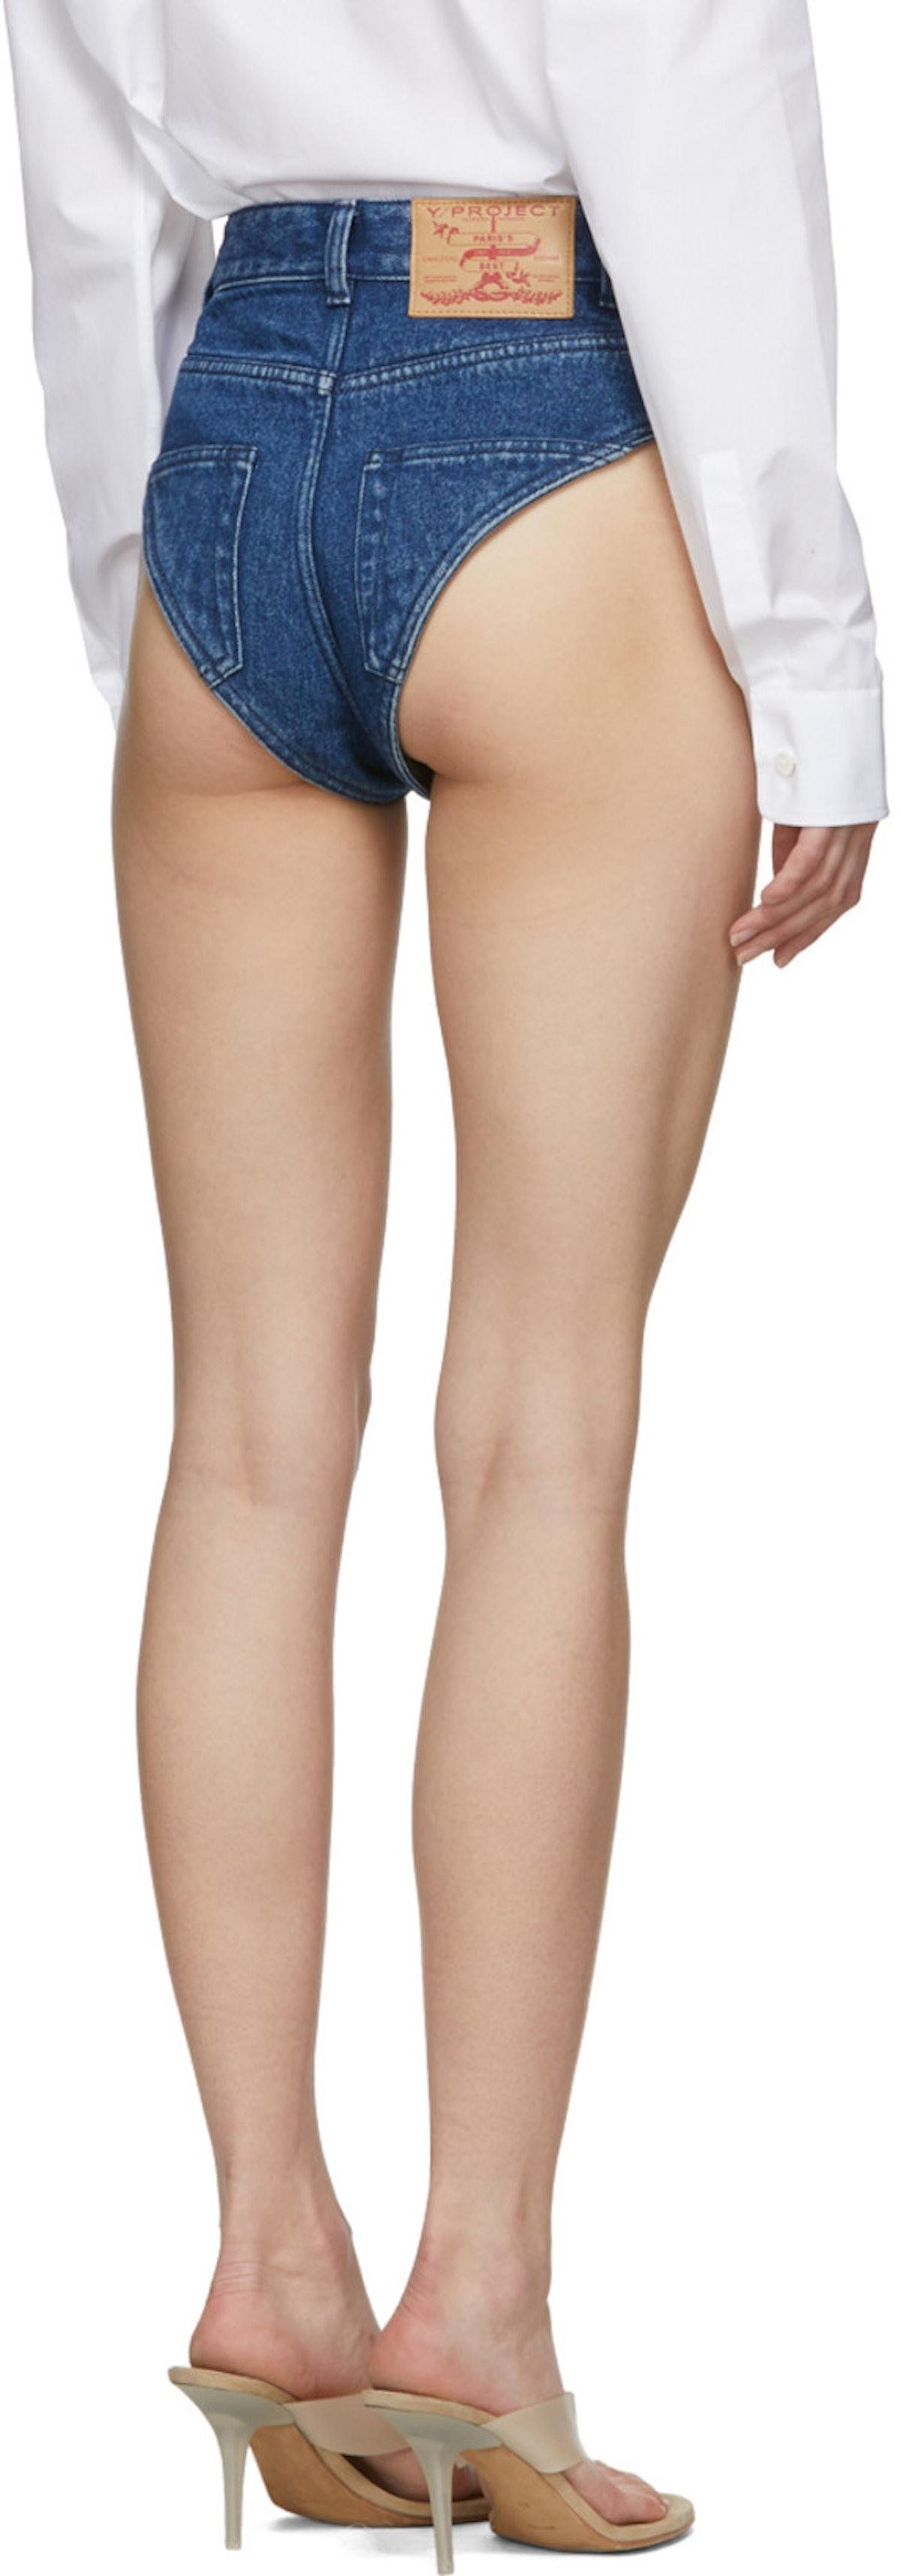 Y/Project  Navy Denim Panties